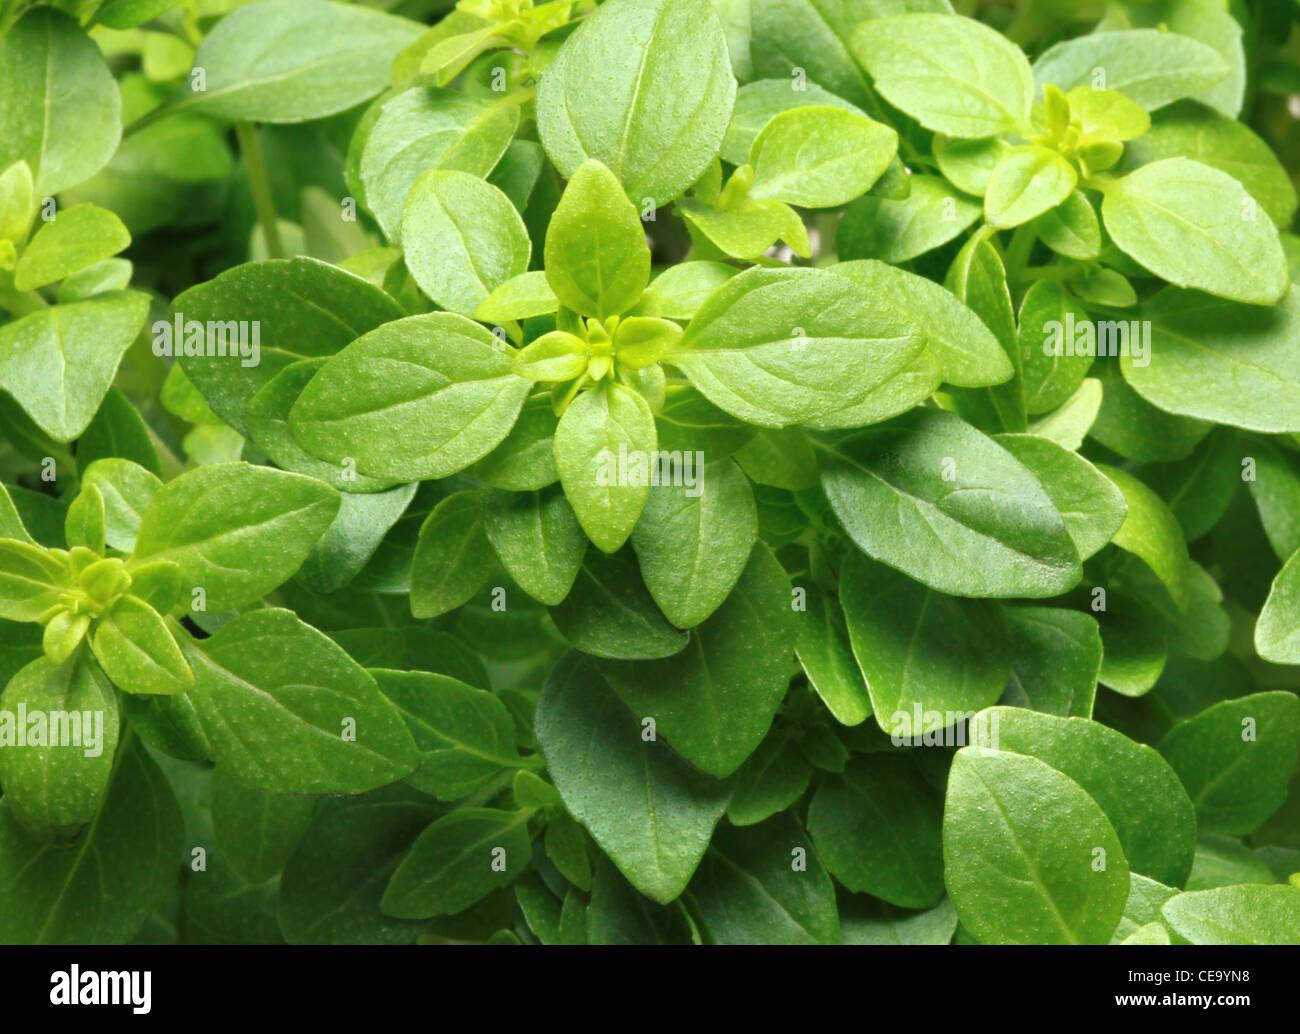 Basil Plant - Stock Image